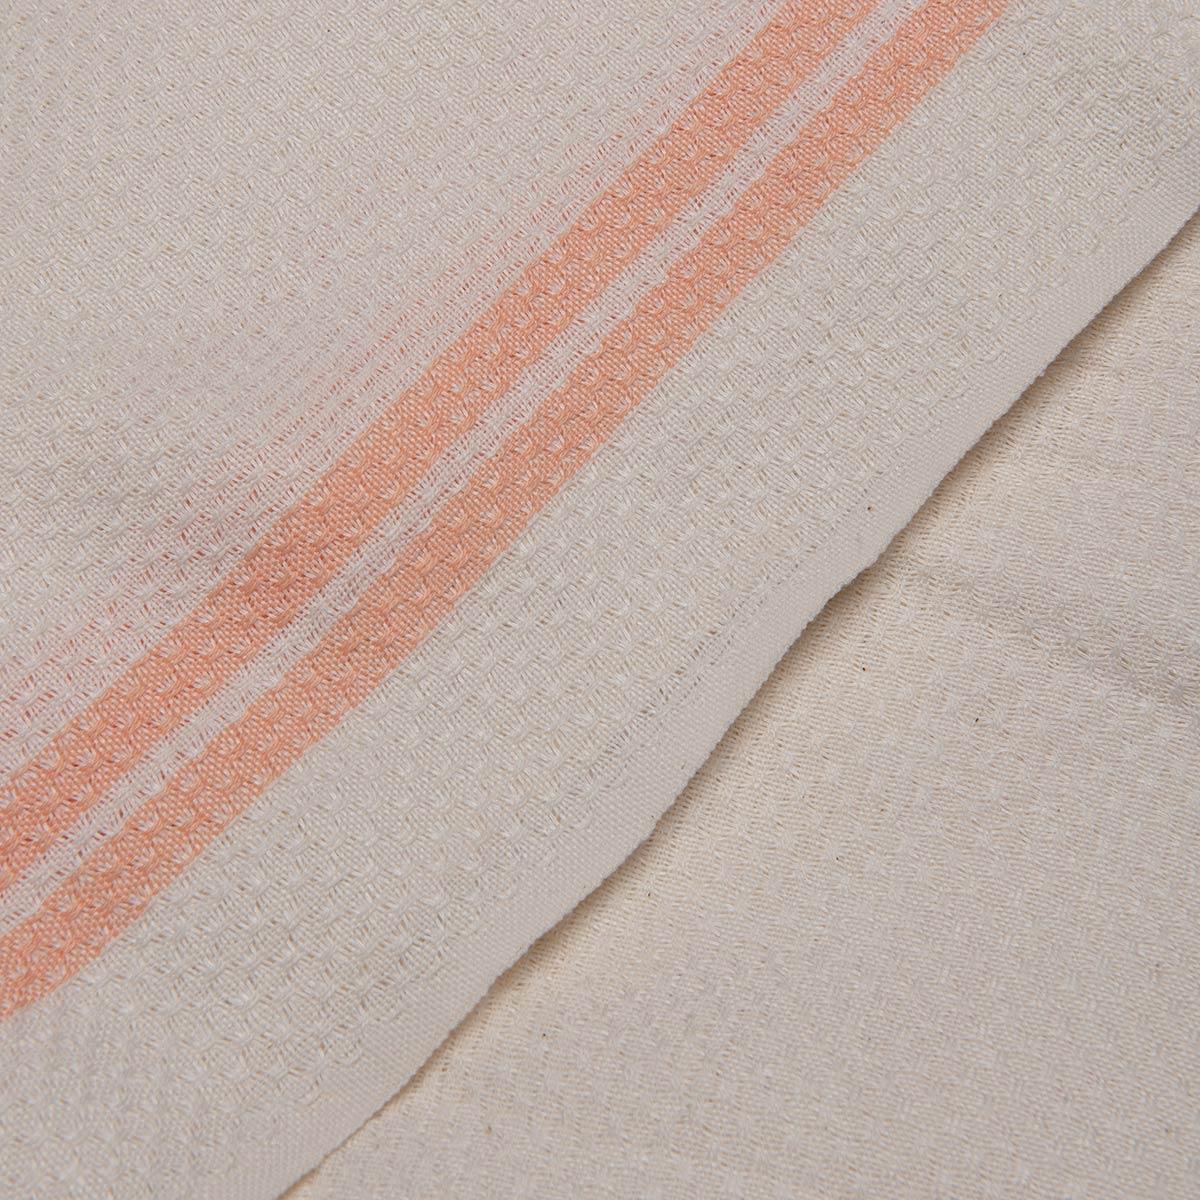 Peshtemal Petek / Ecru - Melon Stripes